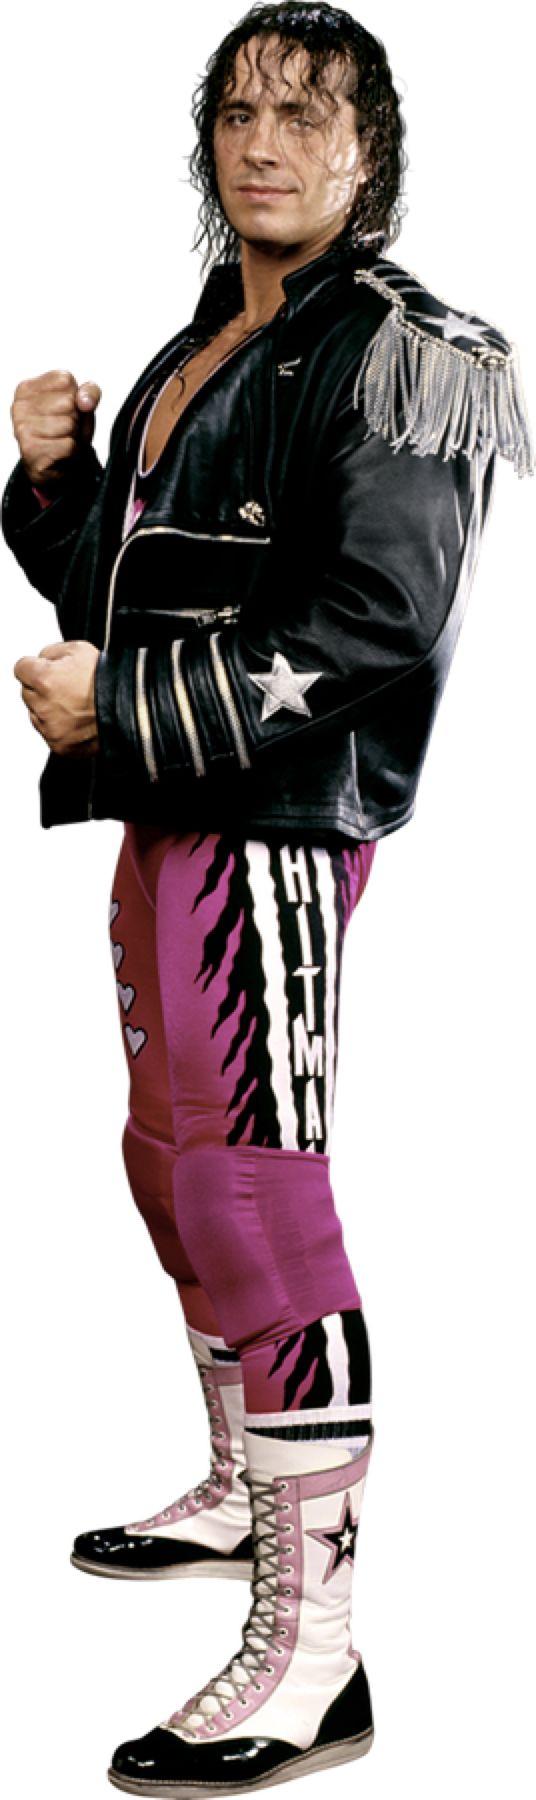 Bret Hart Stats Png By Darkvoidpictures On Deviantart Professional Wrestling Training Center Pro Wrestling